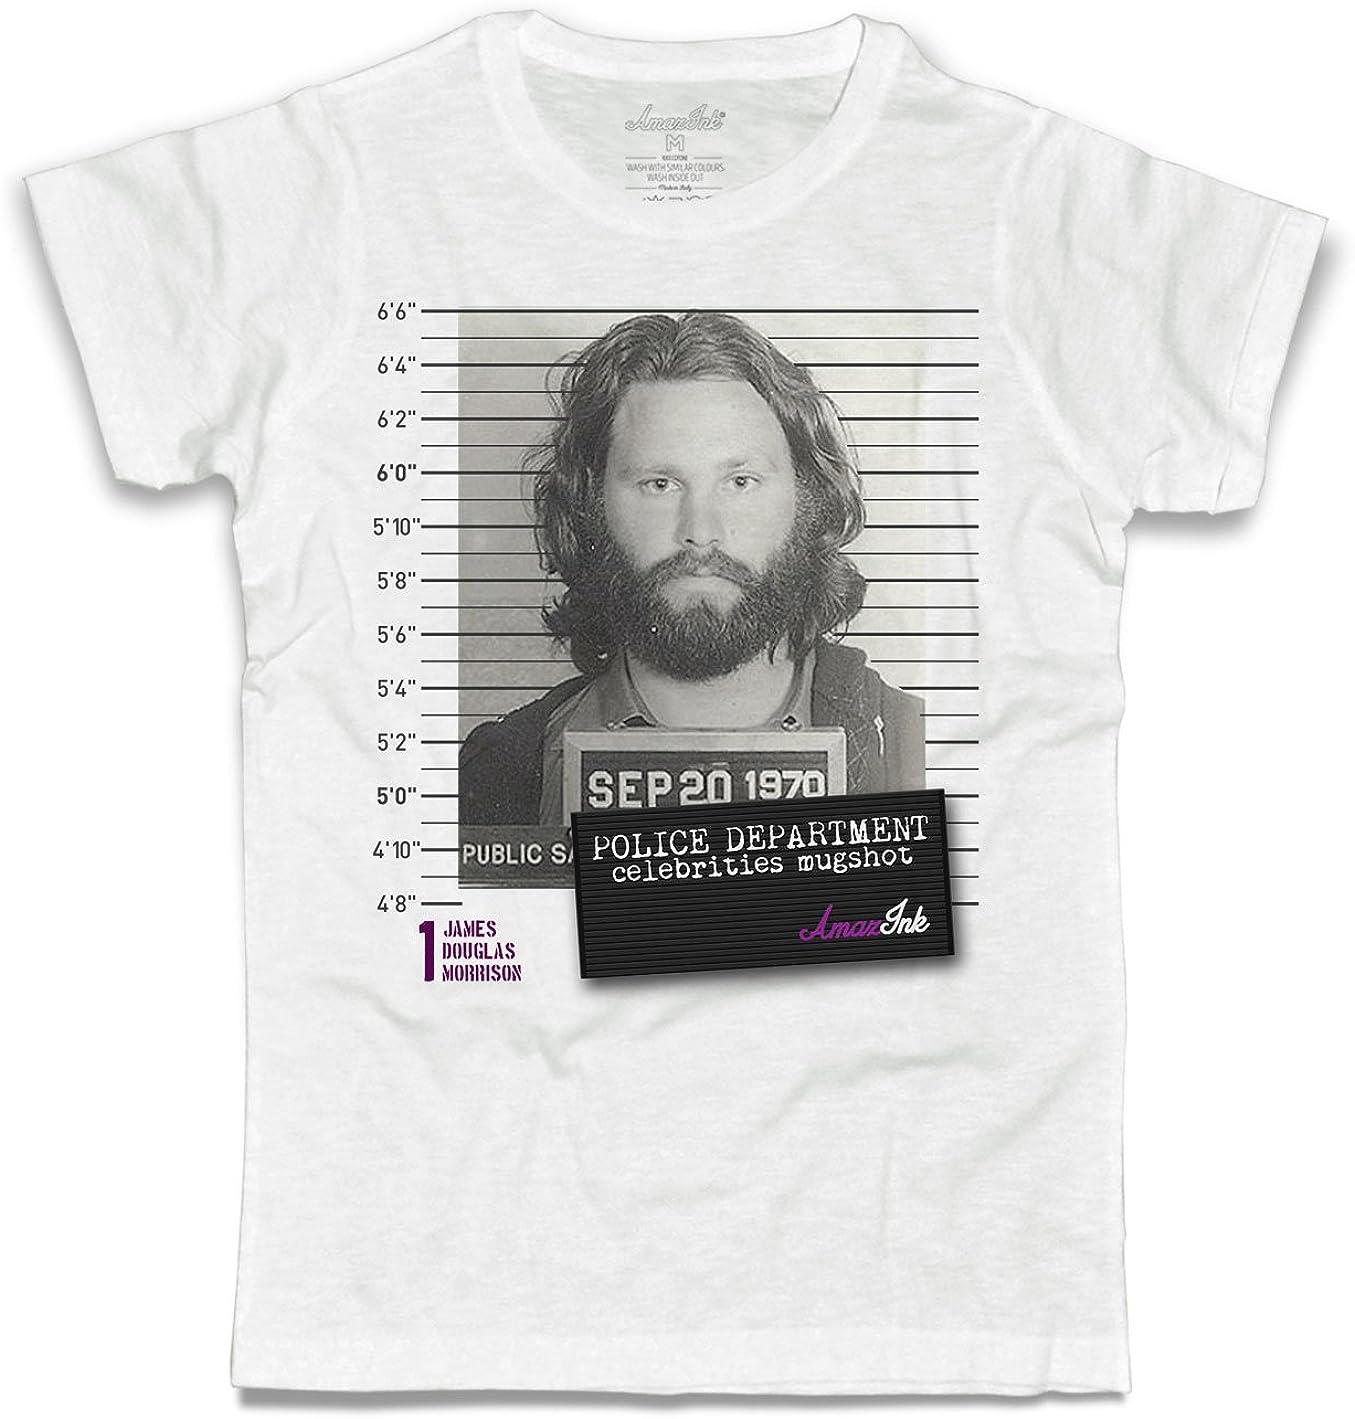 T-shirt donna Jim Morrison Doors foto segnaletica celebrities mugshot Amazink